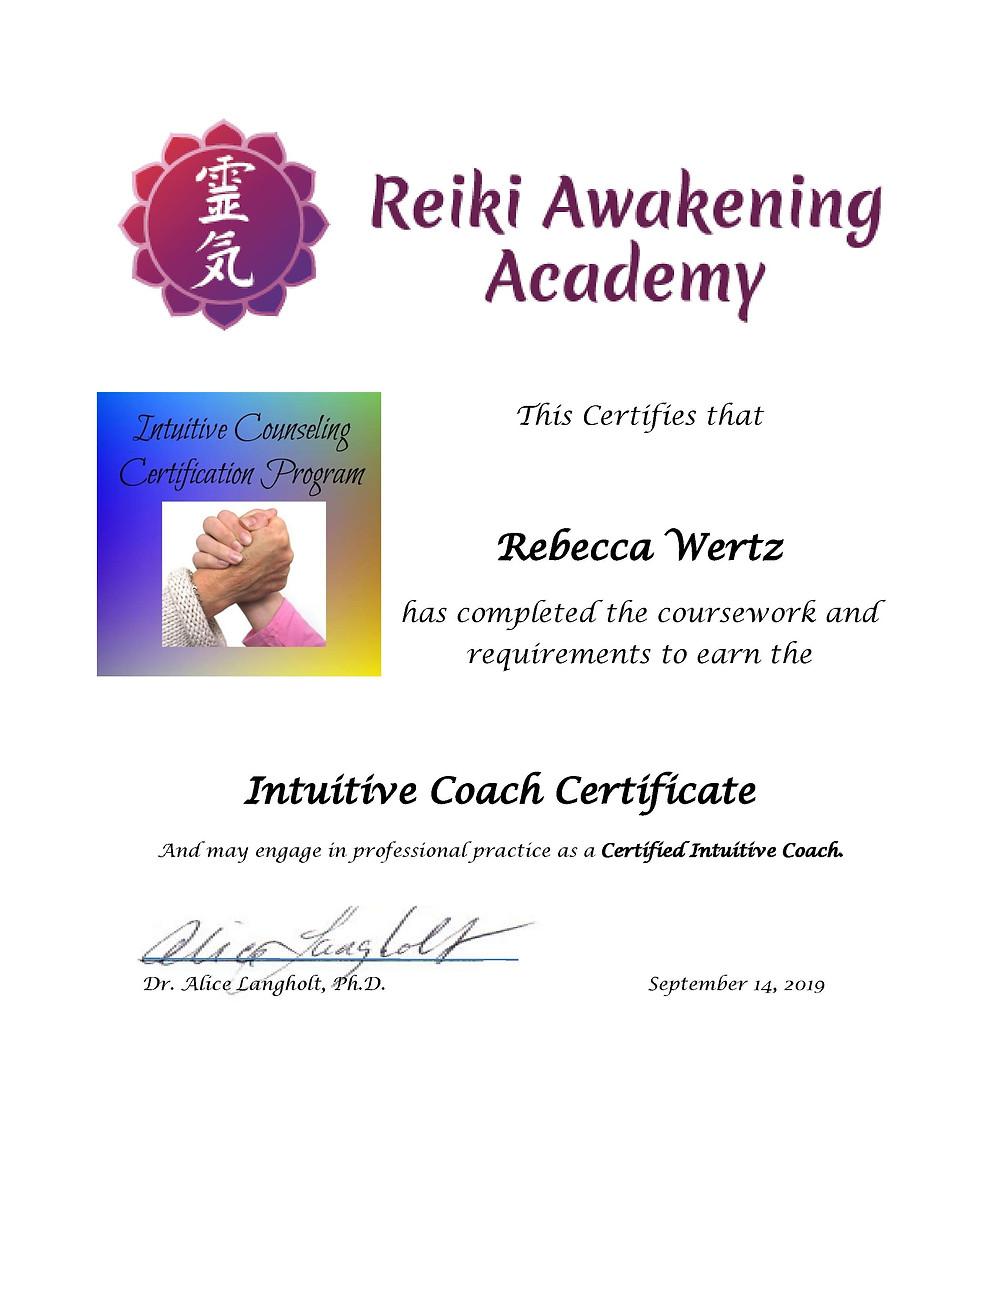 Intuitive Coach Certificate from Reiki Awakening Academy